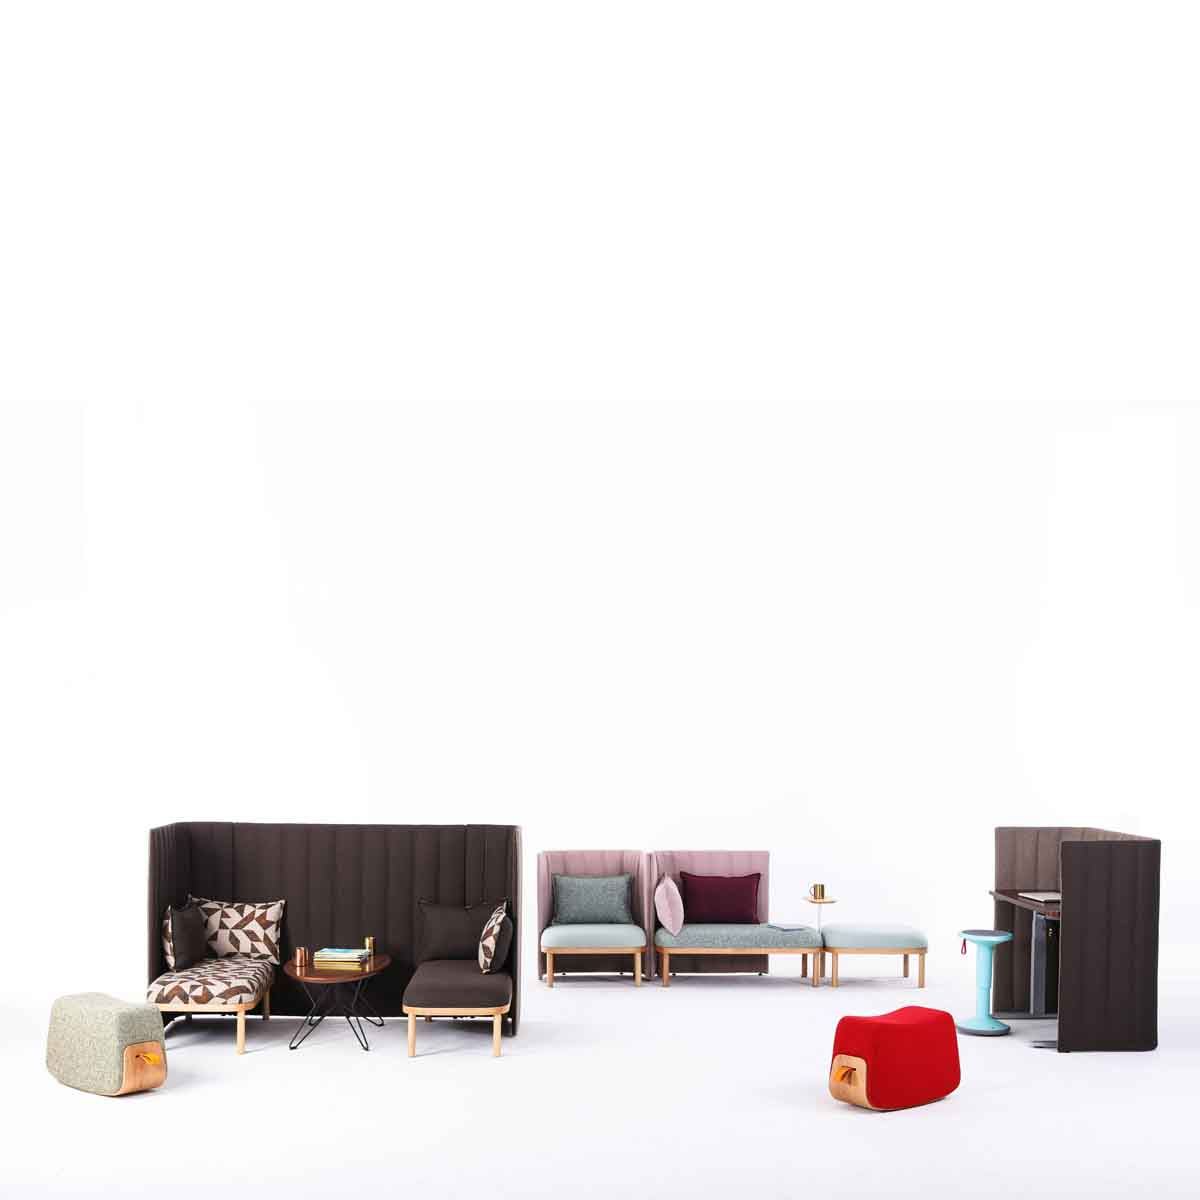 DASH-N屏风沙发_办公空间沙发图片